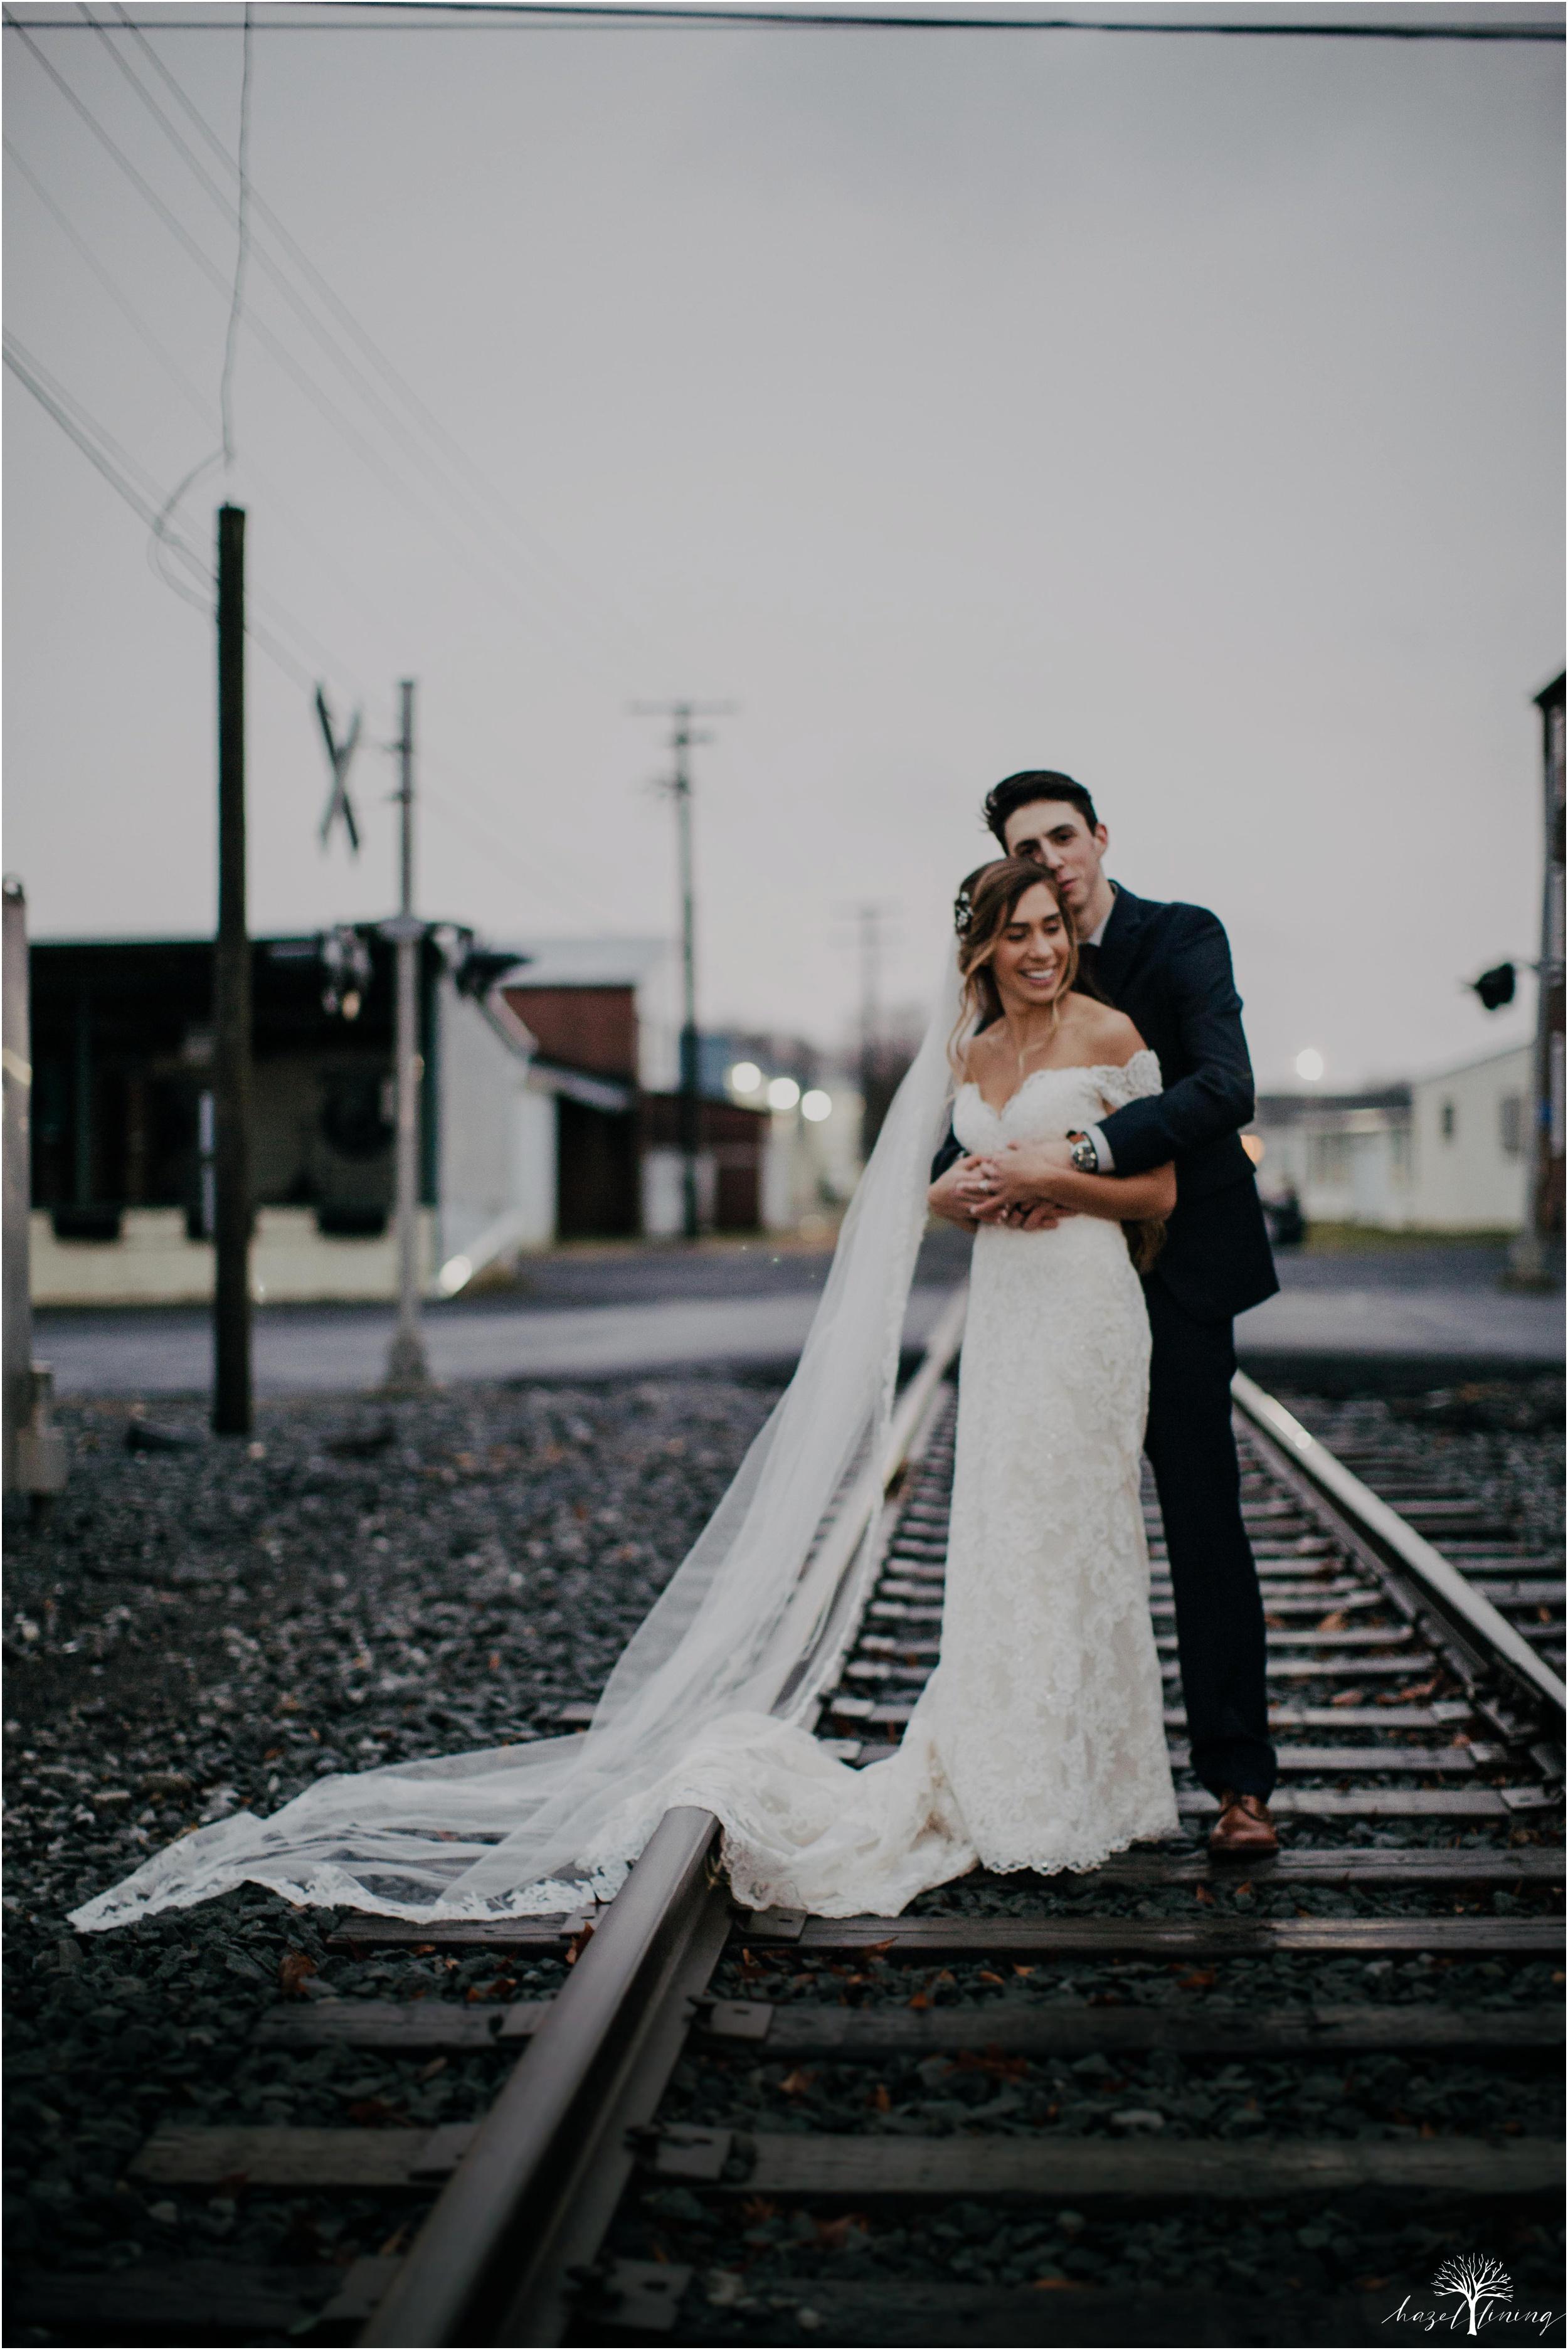 emma-matt-gehringer-the-booking-house-lancaster-manhiem-pennsylvania-winter-wedding_0115.jpg